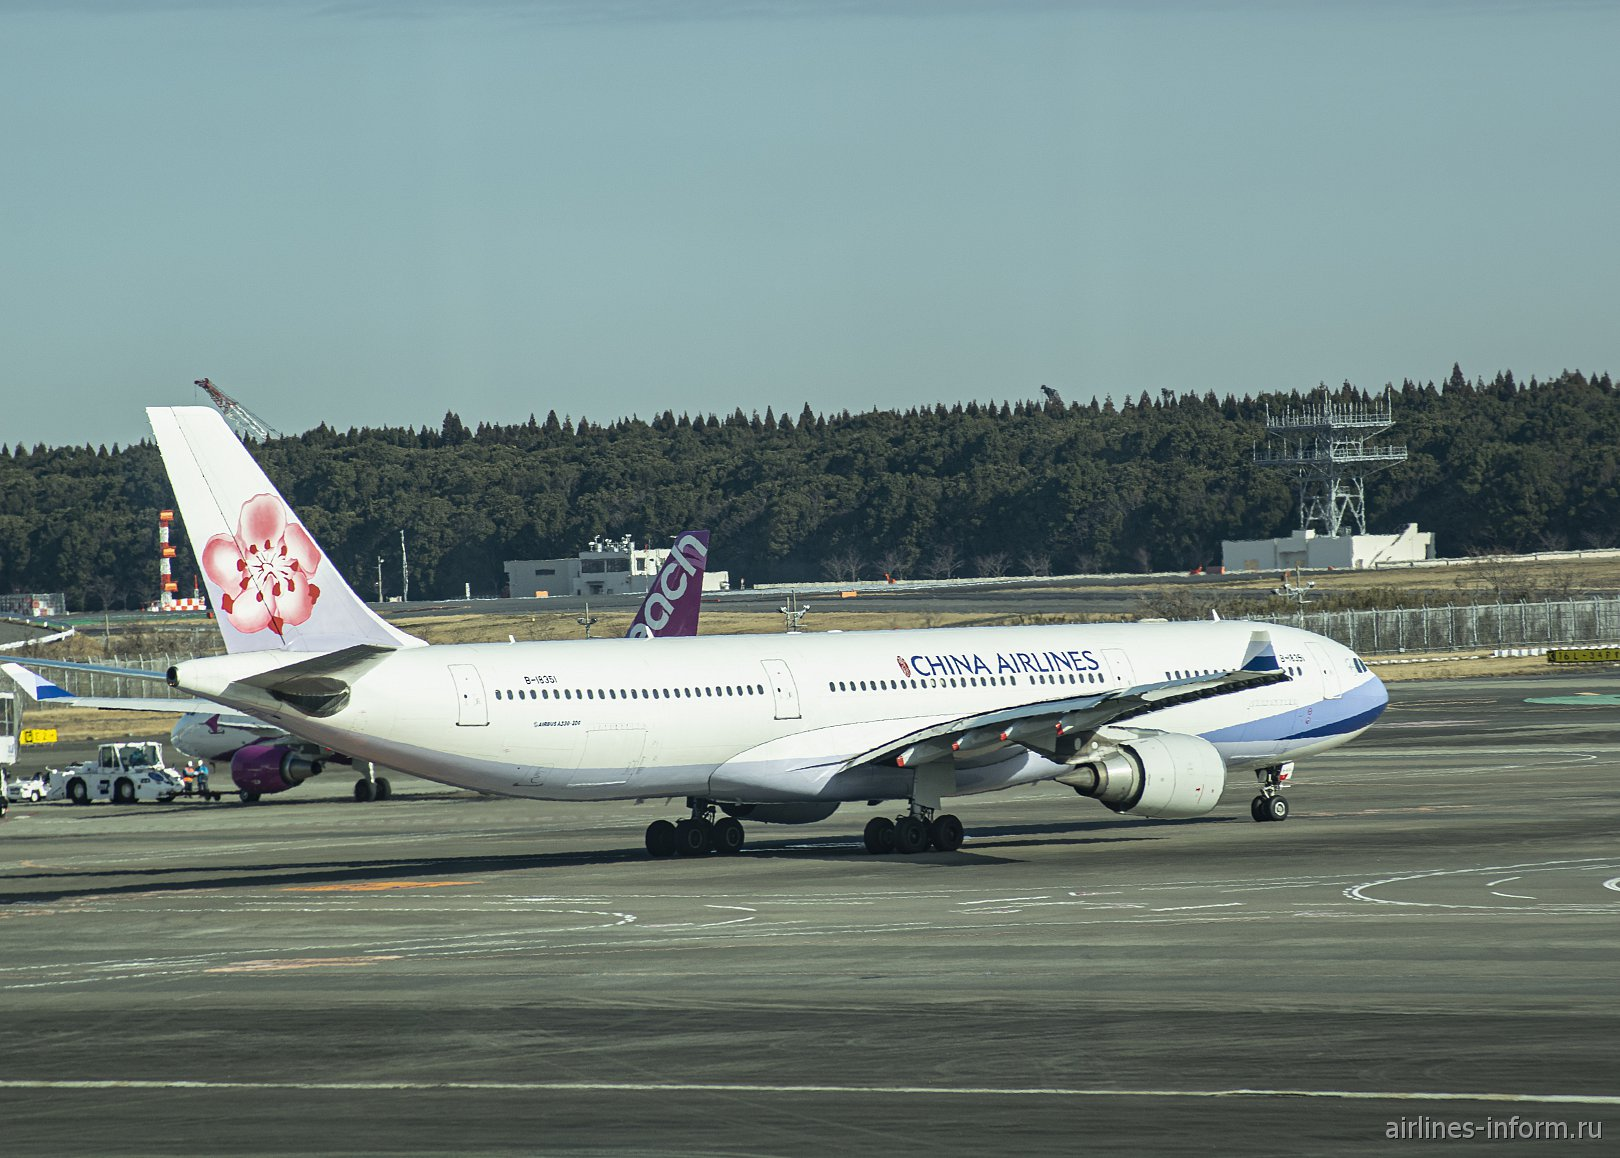 Airbus A330-300 авиакомпании China Airlines в аэропорту Токио Нарита